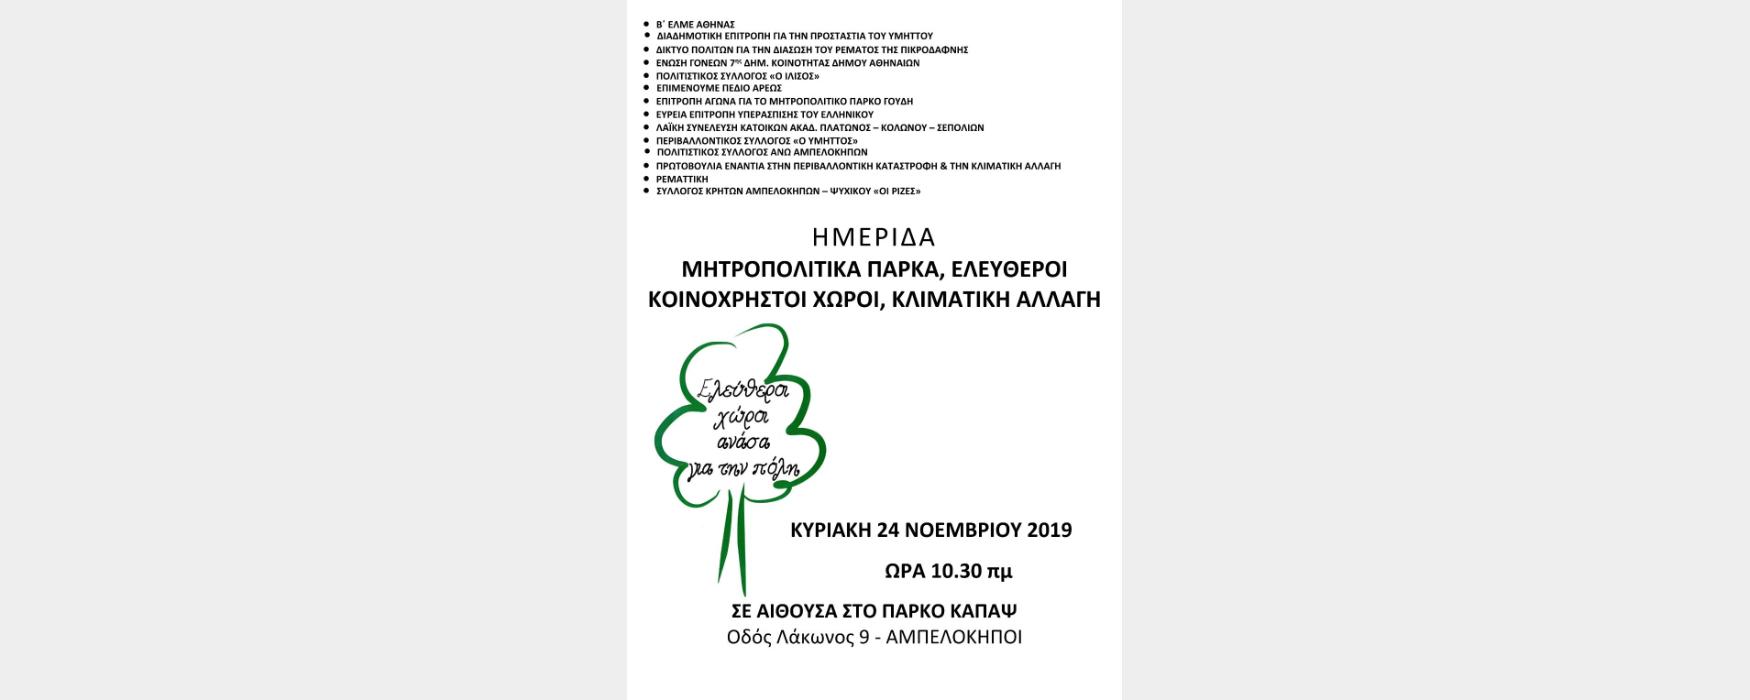 hmerida-mhtropolitika-parka-24112019